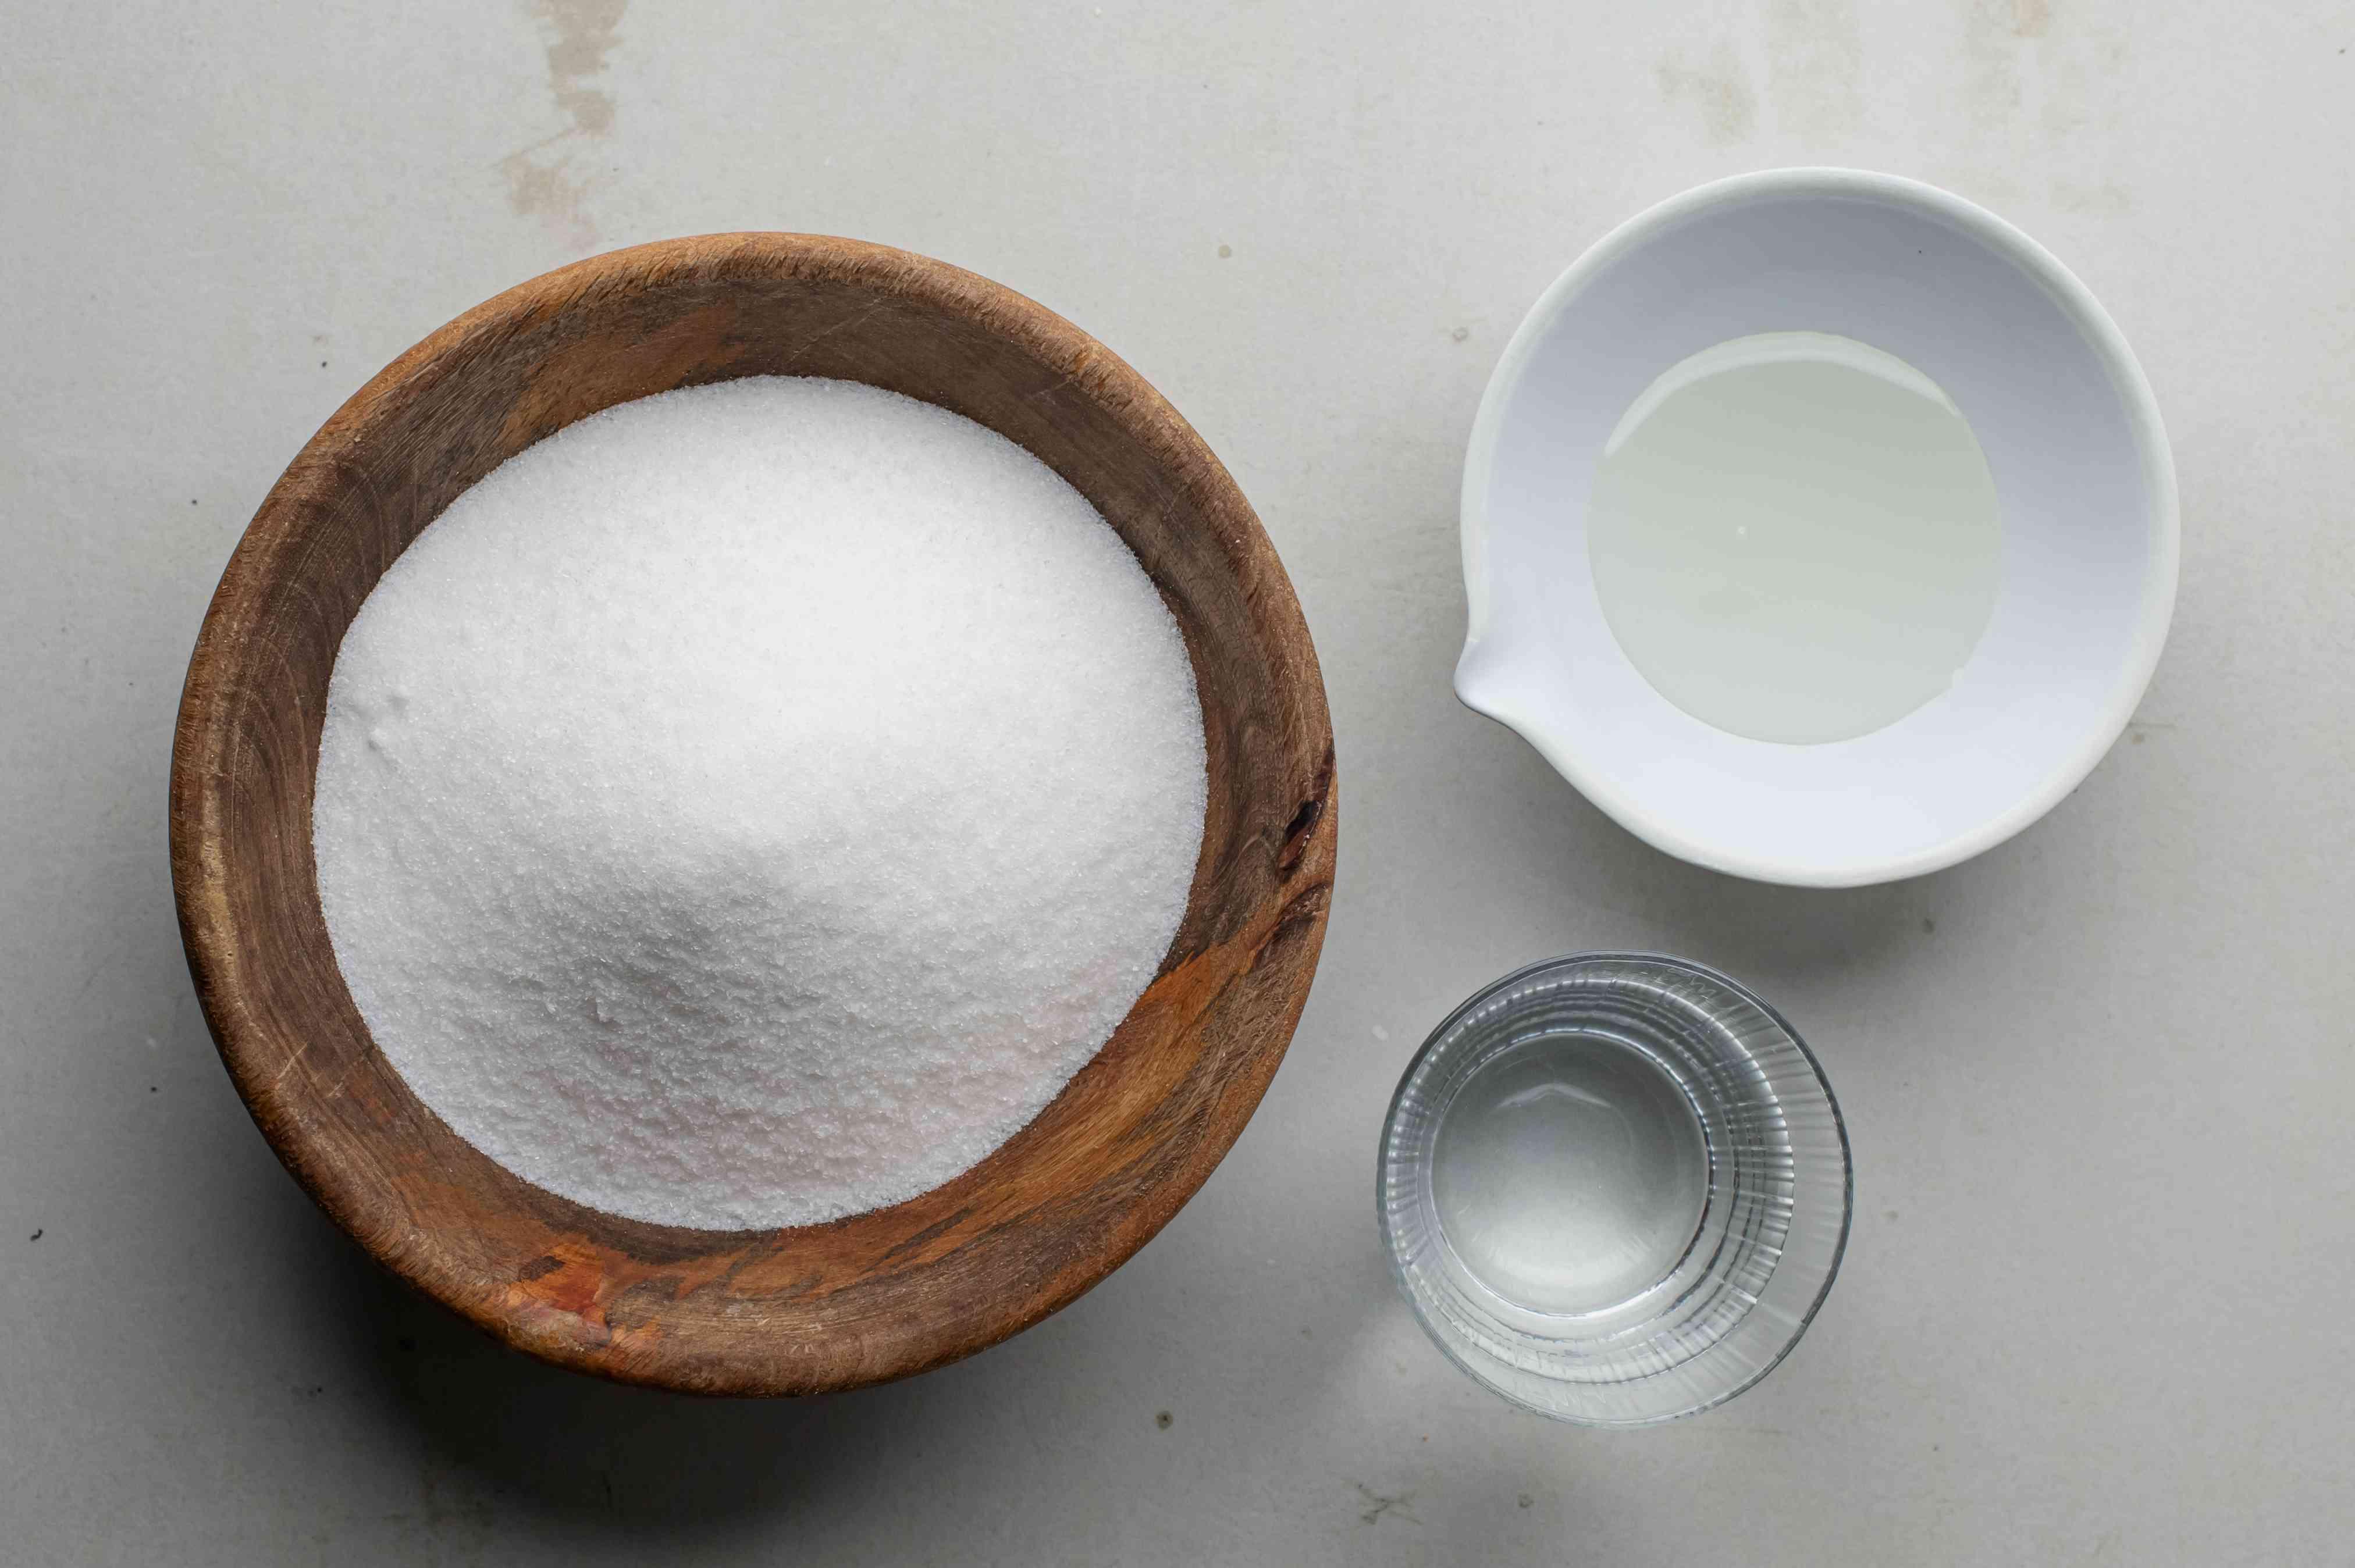 Ingredients for basic fondant